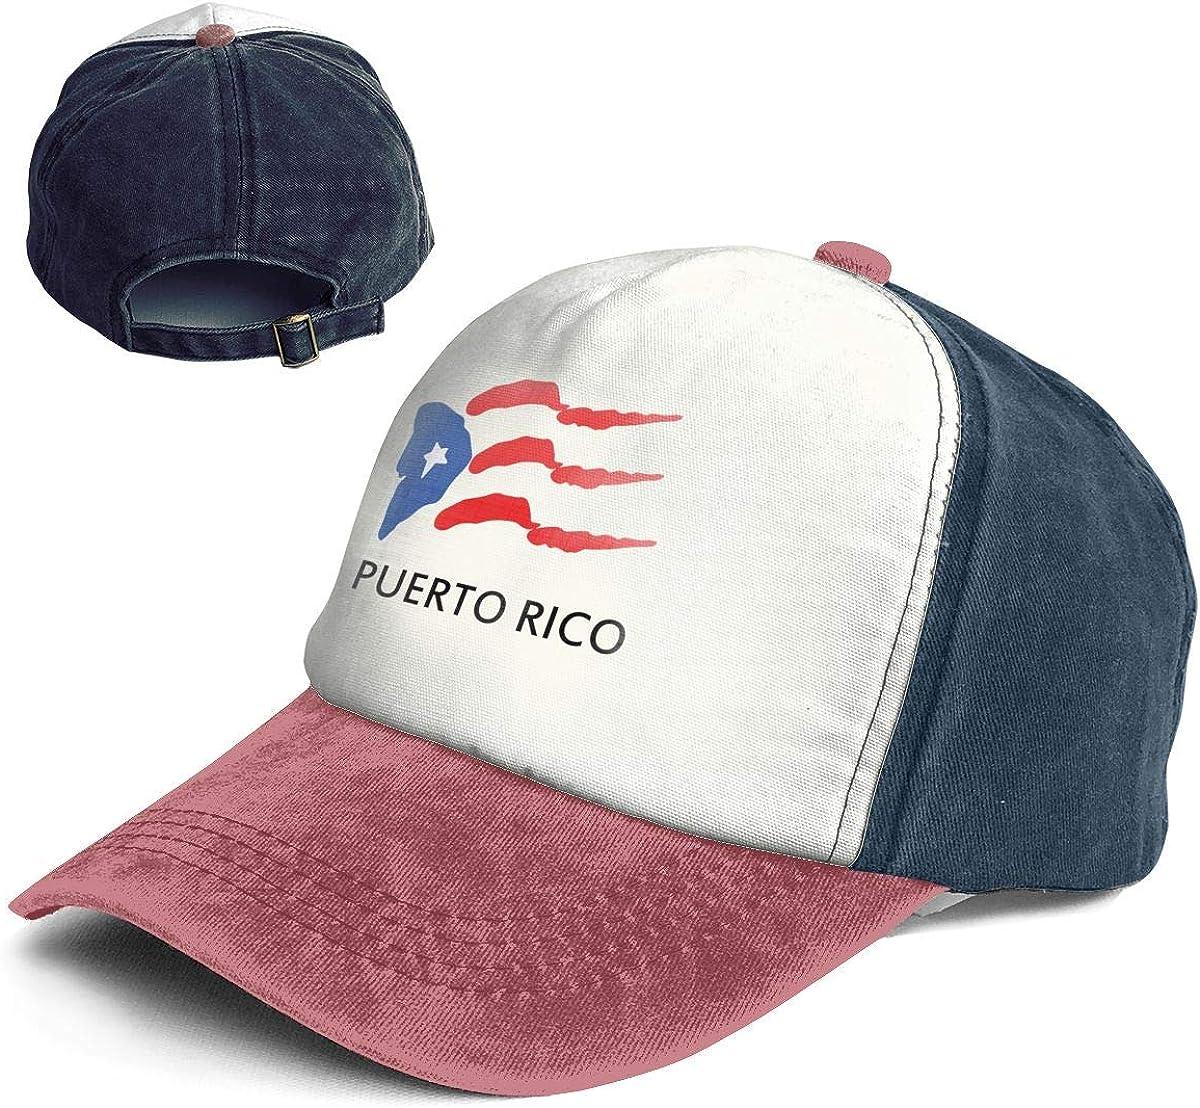 Fashion Vintage Hat Puerto Rico Flag Tribal Adjustable Dad Hat Baseball Cowboy Cap